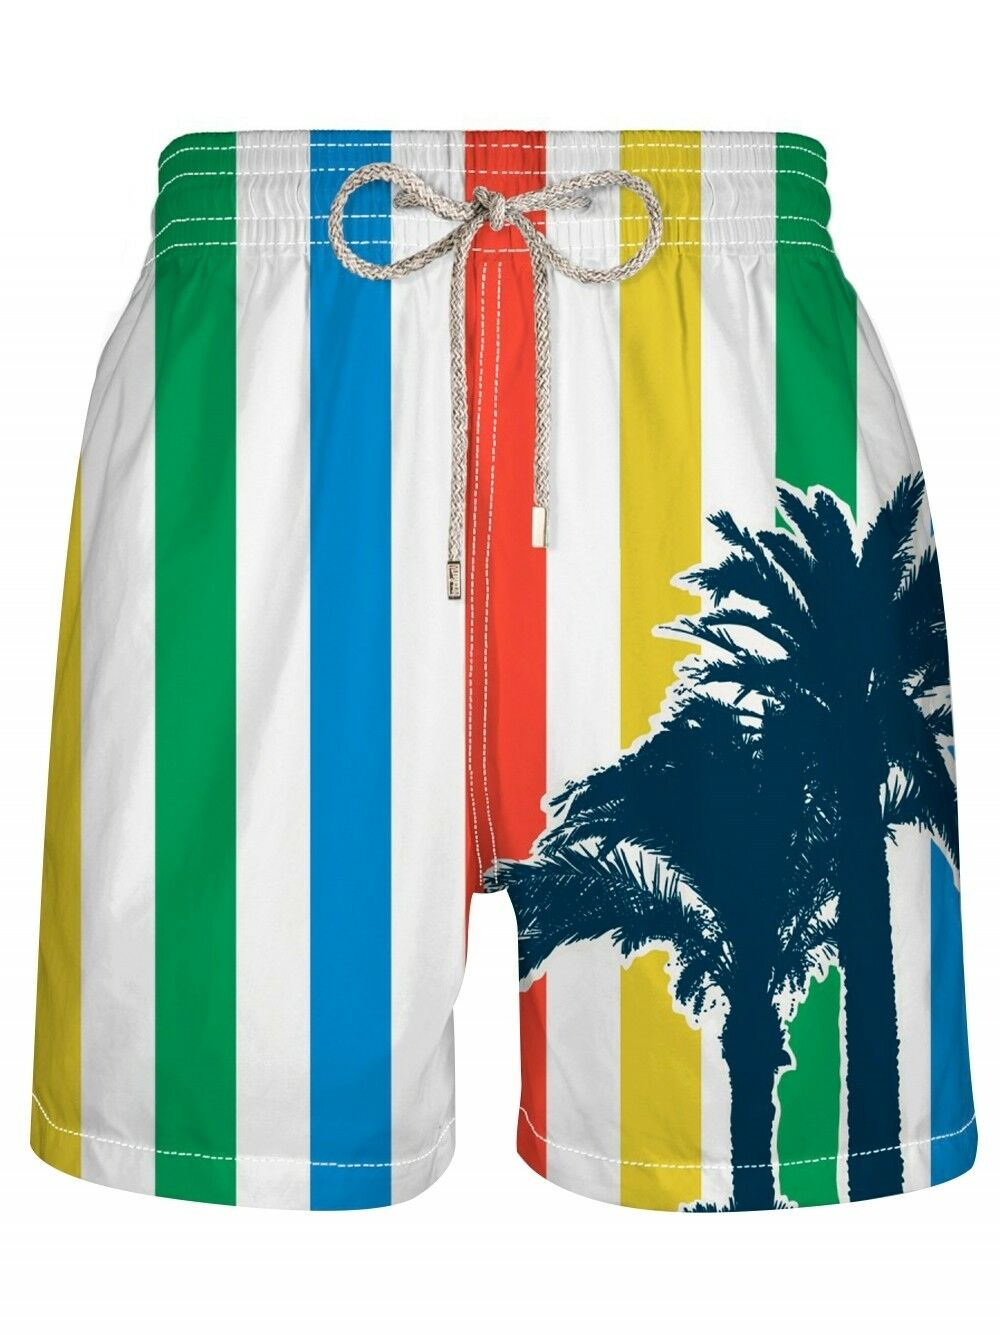 NWT VILEBREQUIN LG (32-34) swim trunks men's swimsuit shorts striped Moorea